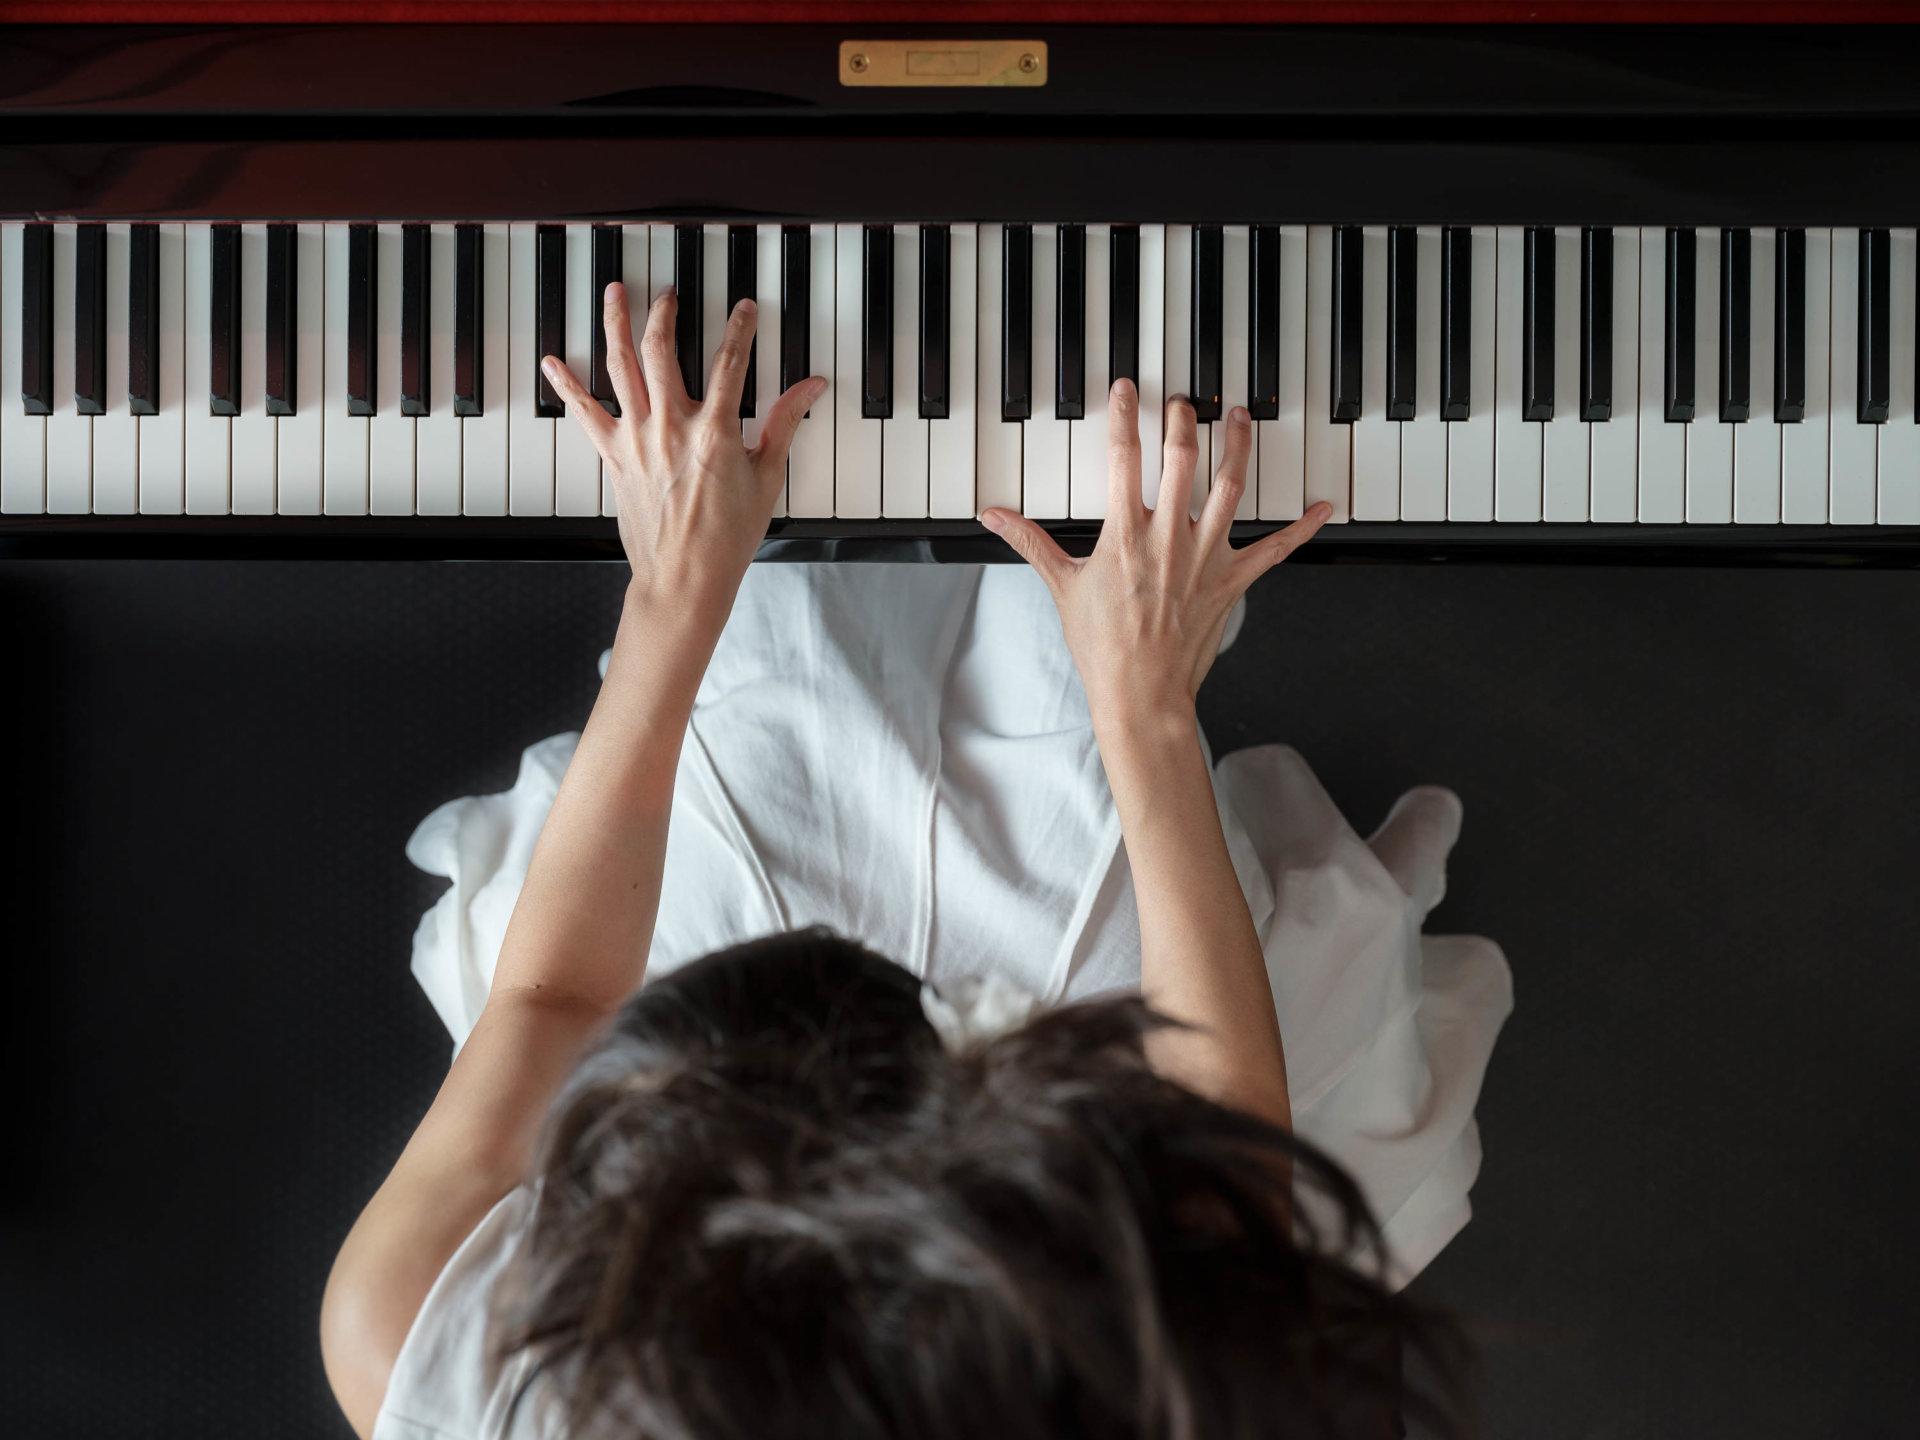 DRUCKEN!, Kultur, MASTERBILD, Pianist, Projekt, Serie, Yamaha CFX Concert Grand Piano, klavier, konzert, meisterfinger, musiker, piano